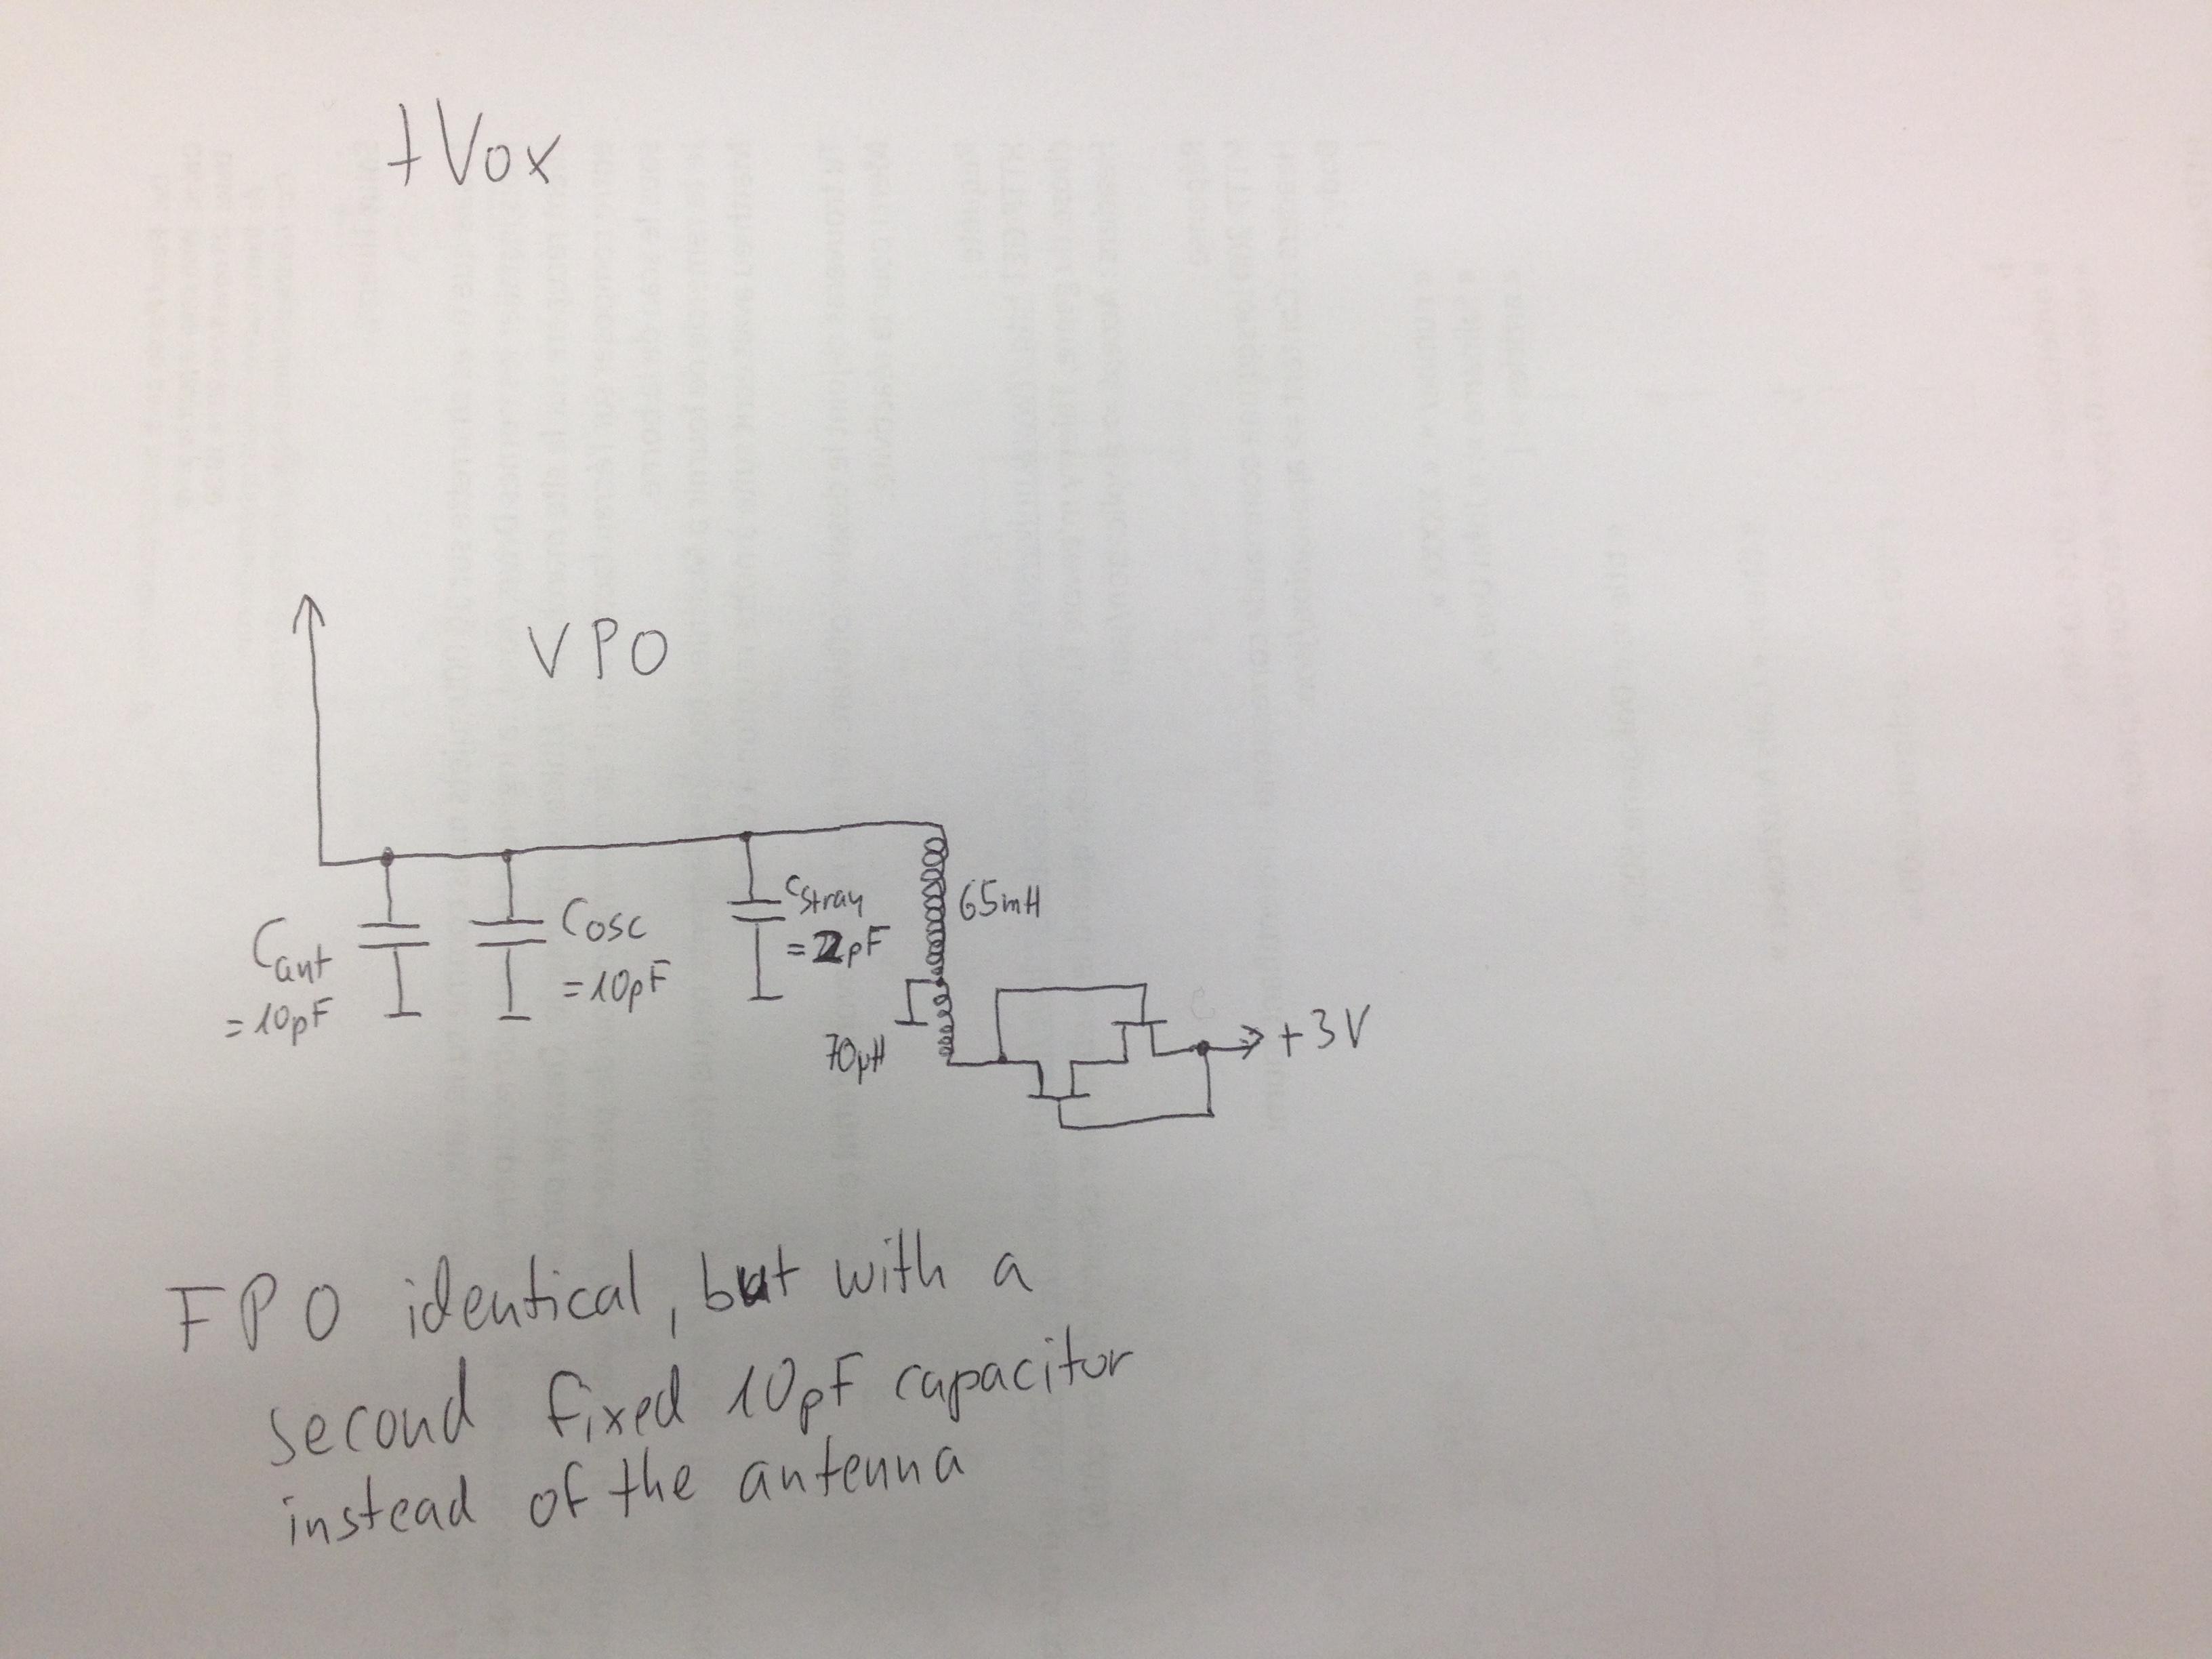 tVox VPO